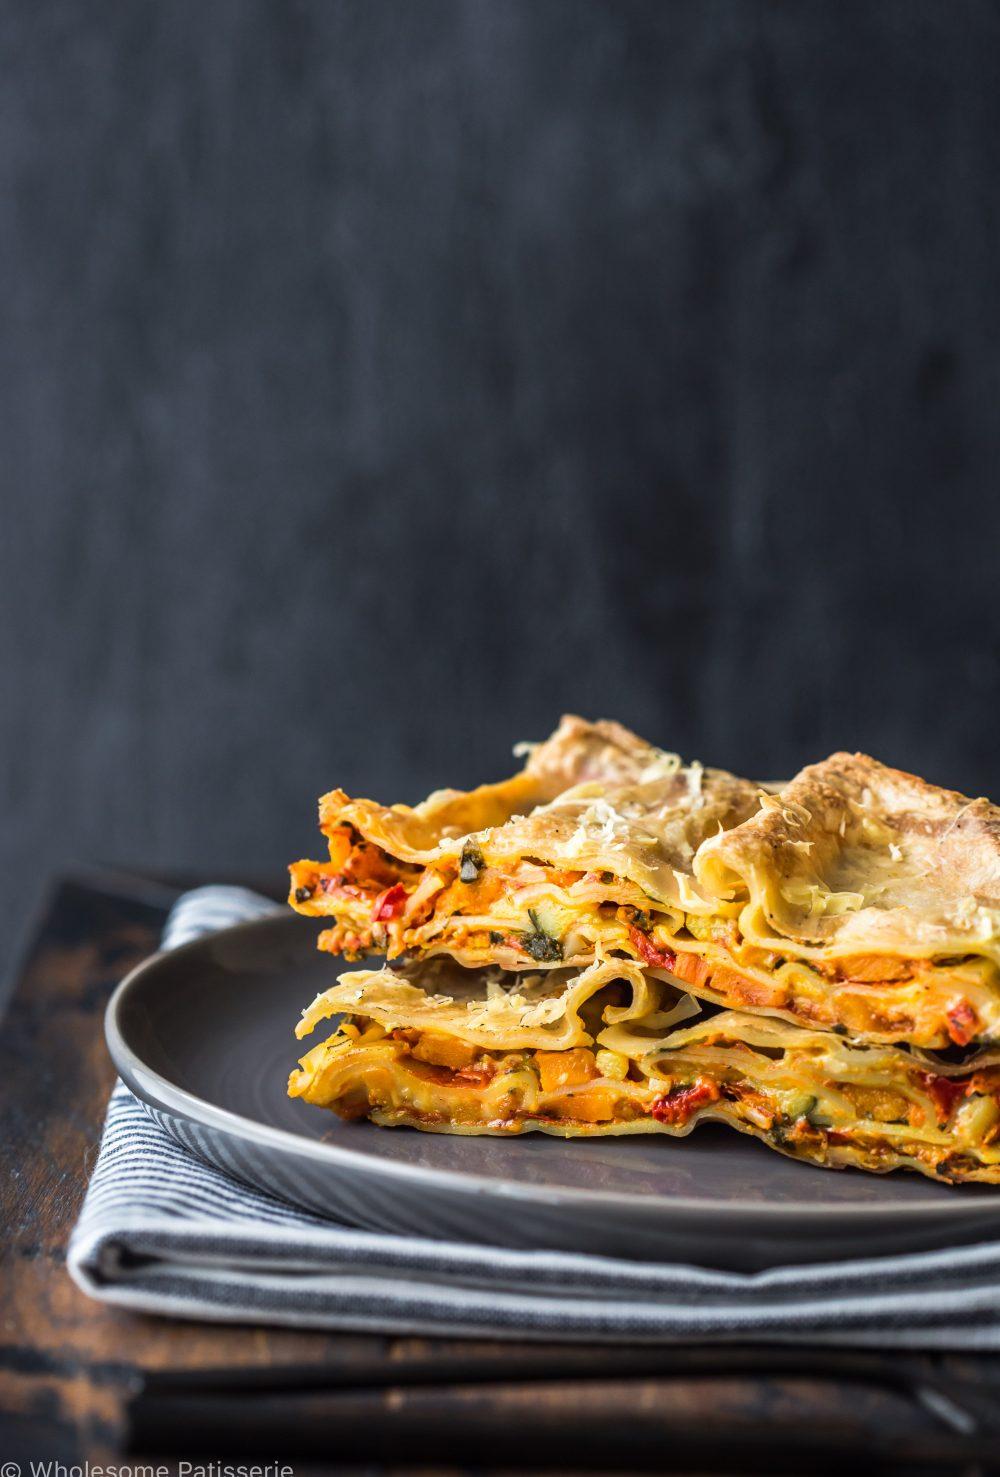 vegetarian-lasagne-gluten-free-delicious-dinner-easy-healthy-family